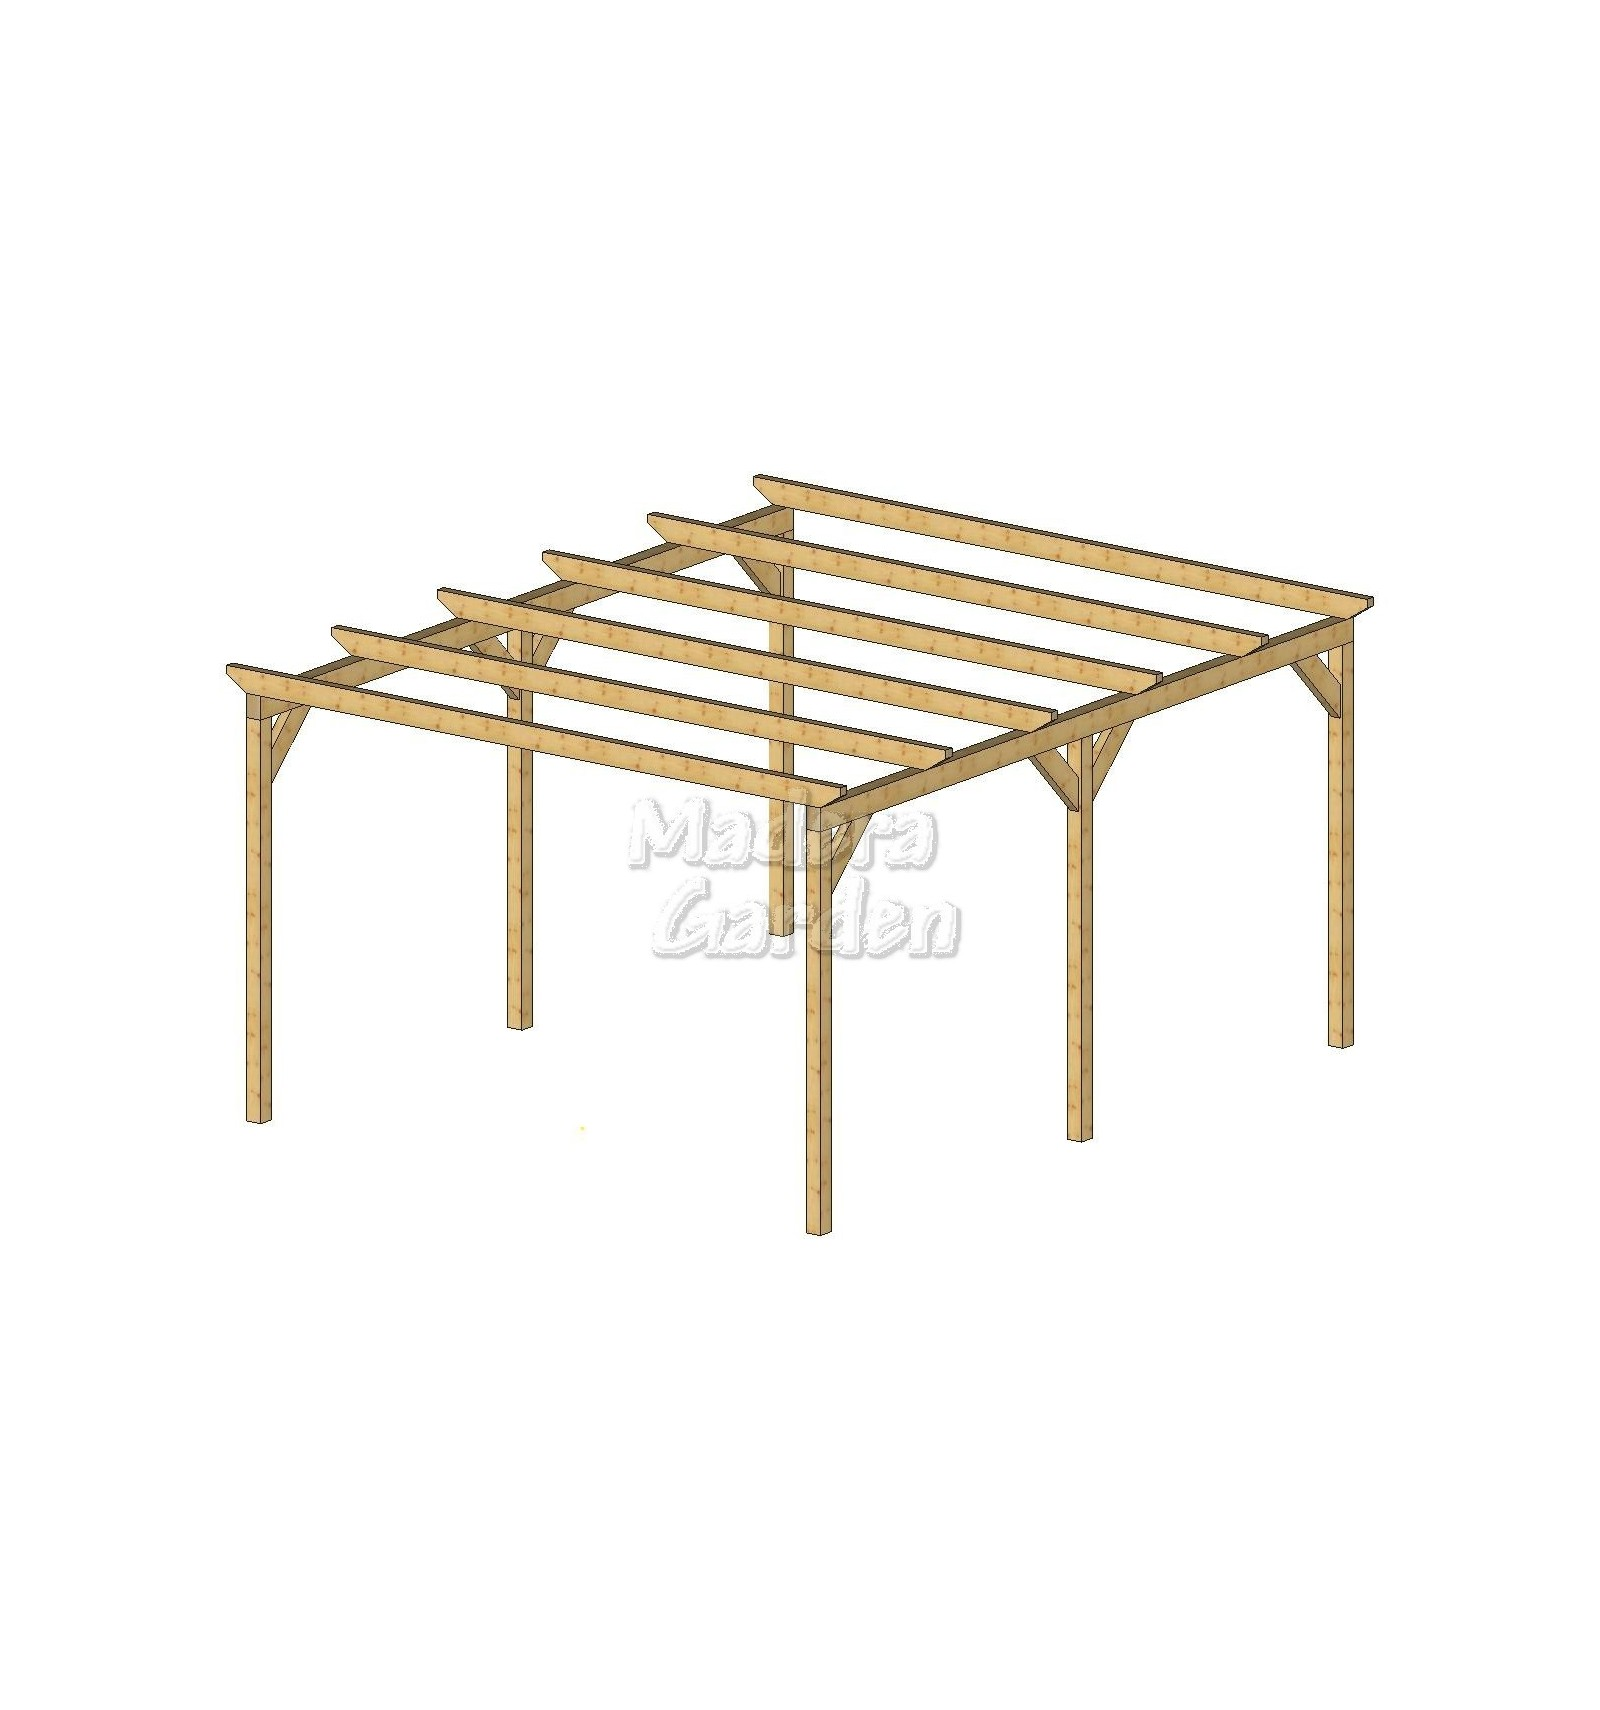 P rgolas de madera autoportantes planas madera garden - Pergolas de madera en kit ...